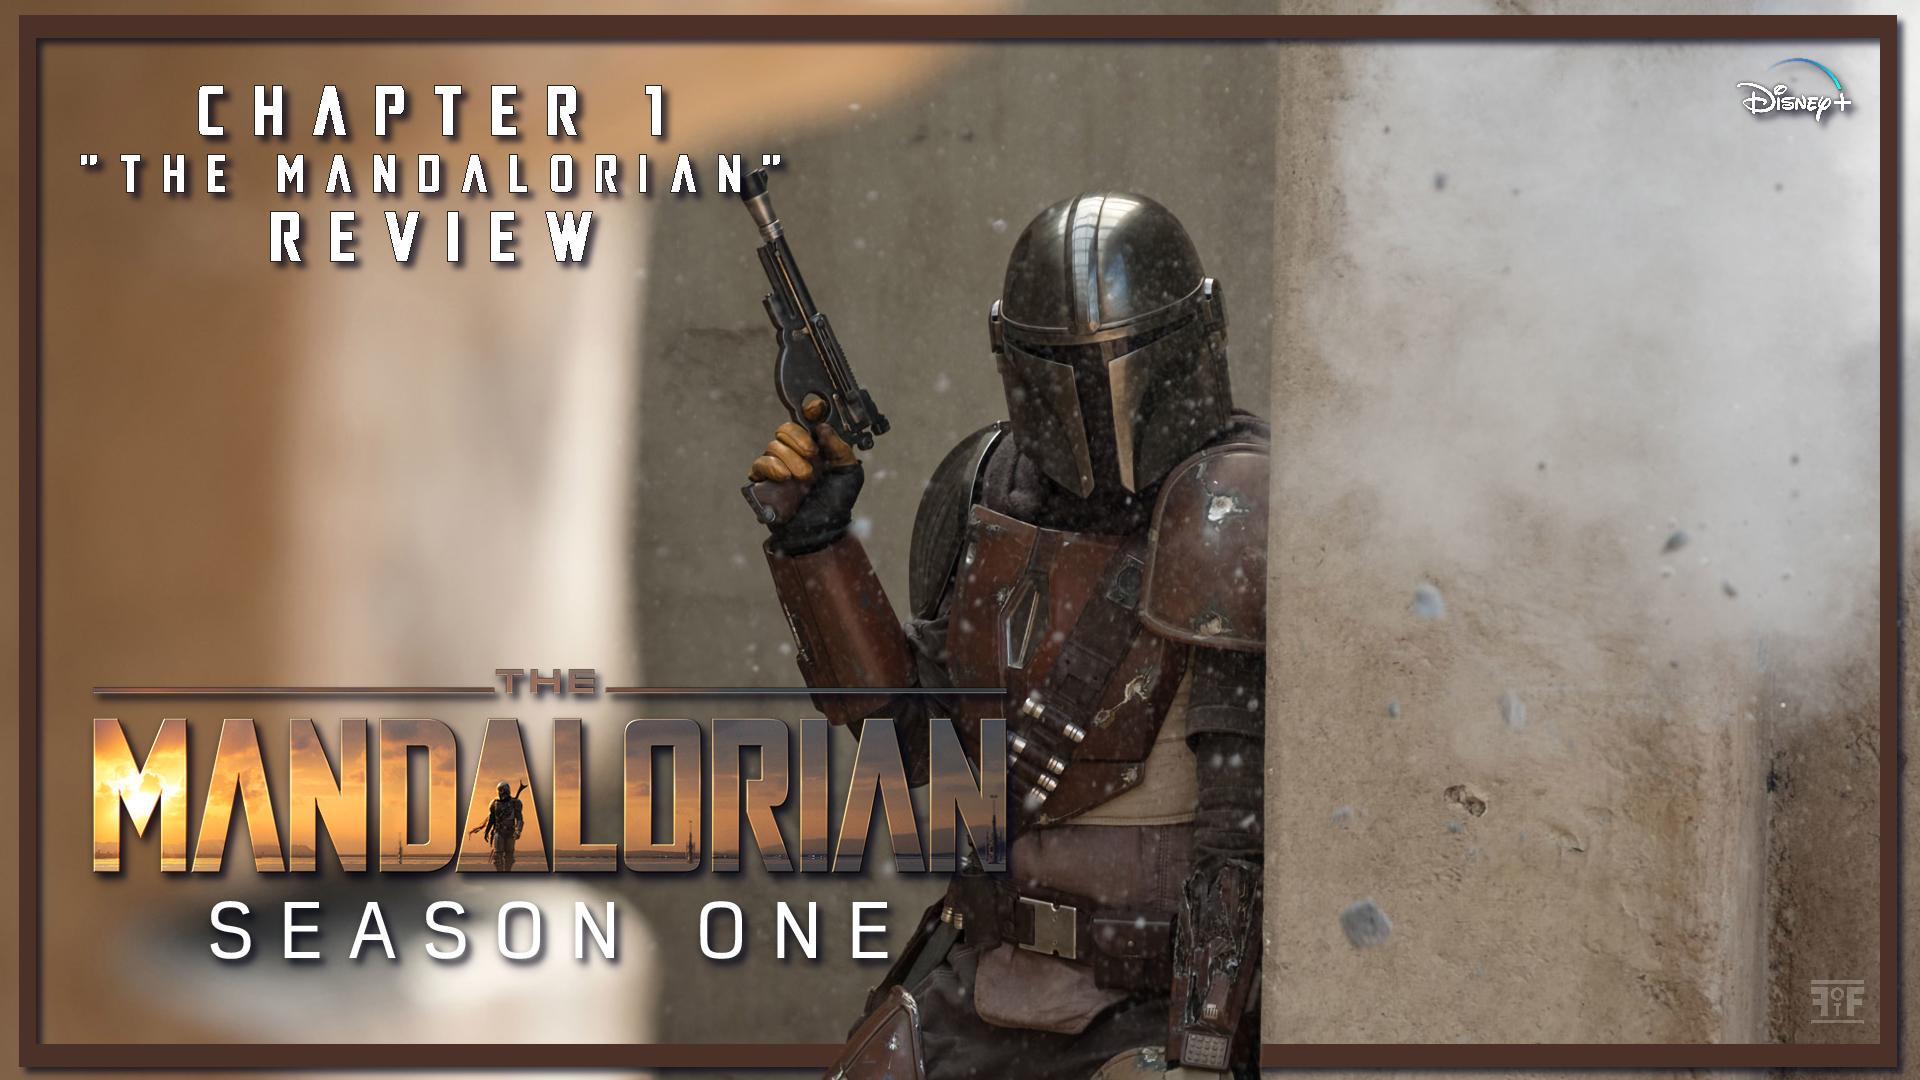 The Mandalorian Chapter 1 The Mandalorian Review